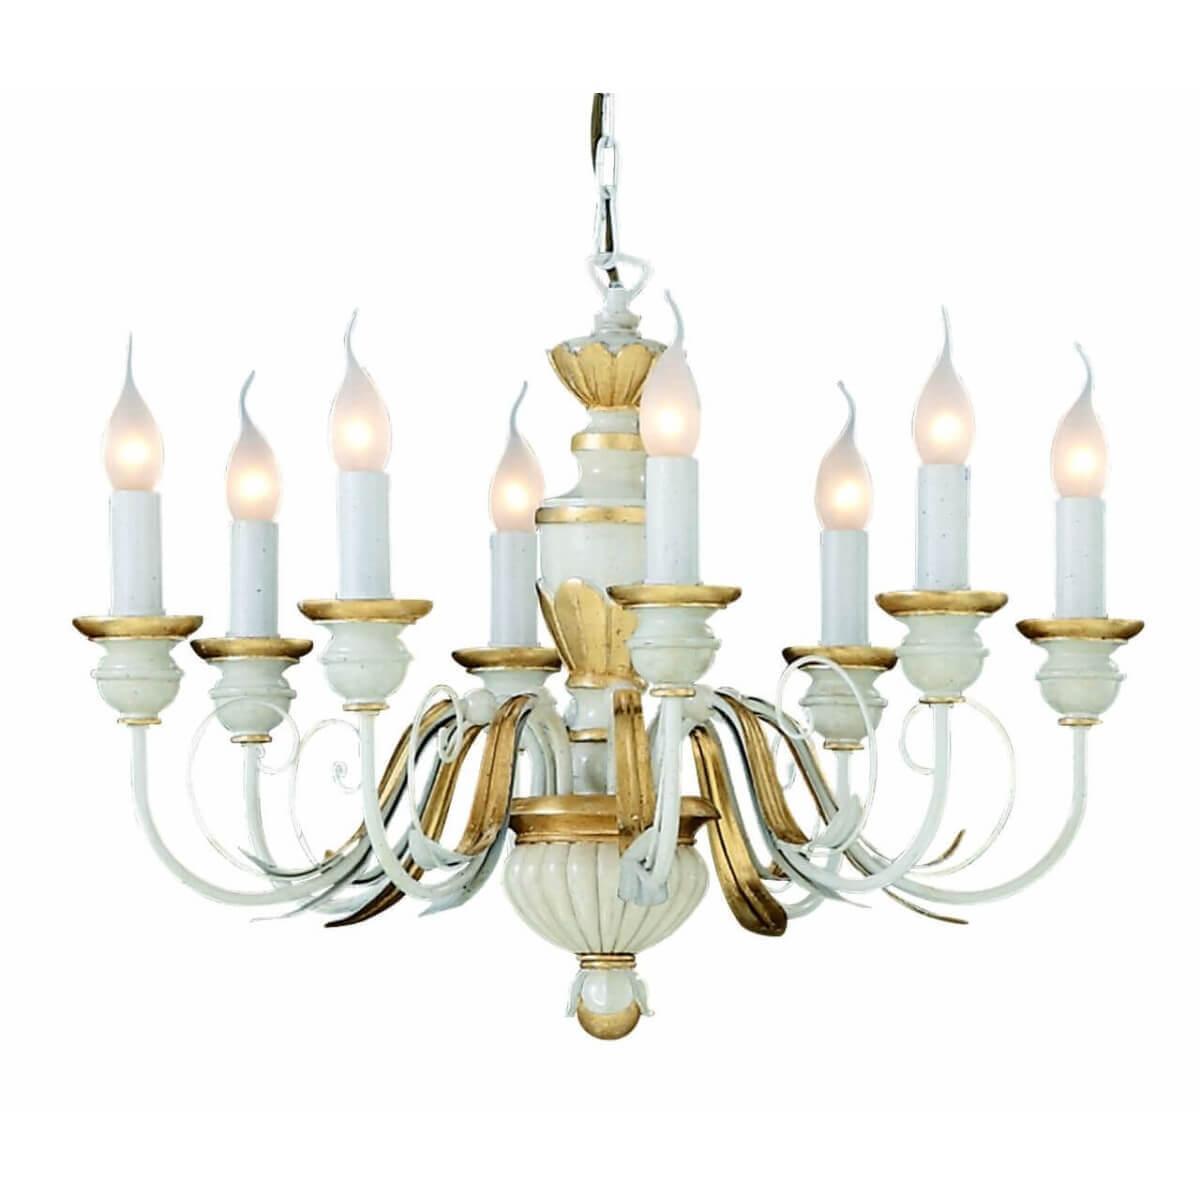 Подвесная люстра Ideal Lux Firenze Sp8 Bianco Antico 012872